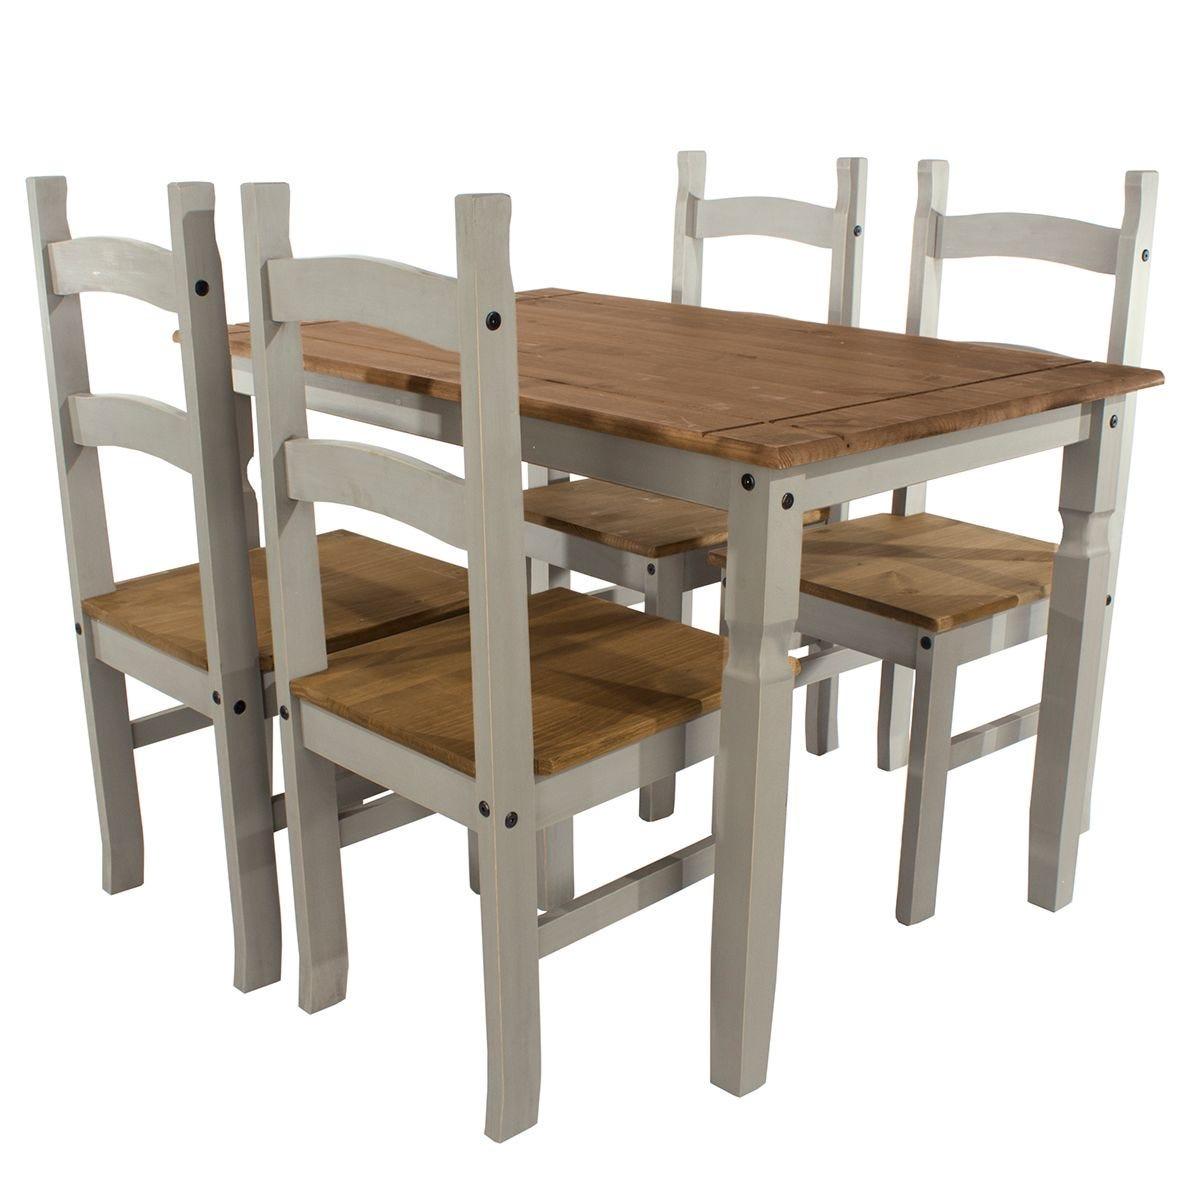 Halea Medium Rectangular Dining Table And 4 Chairs - Grey